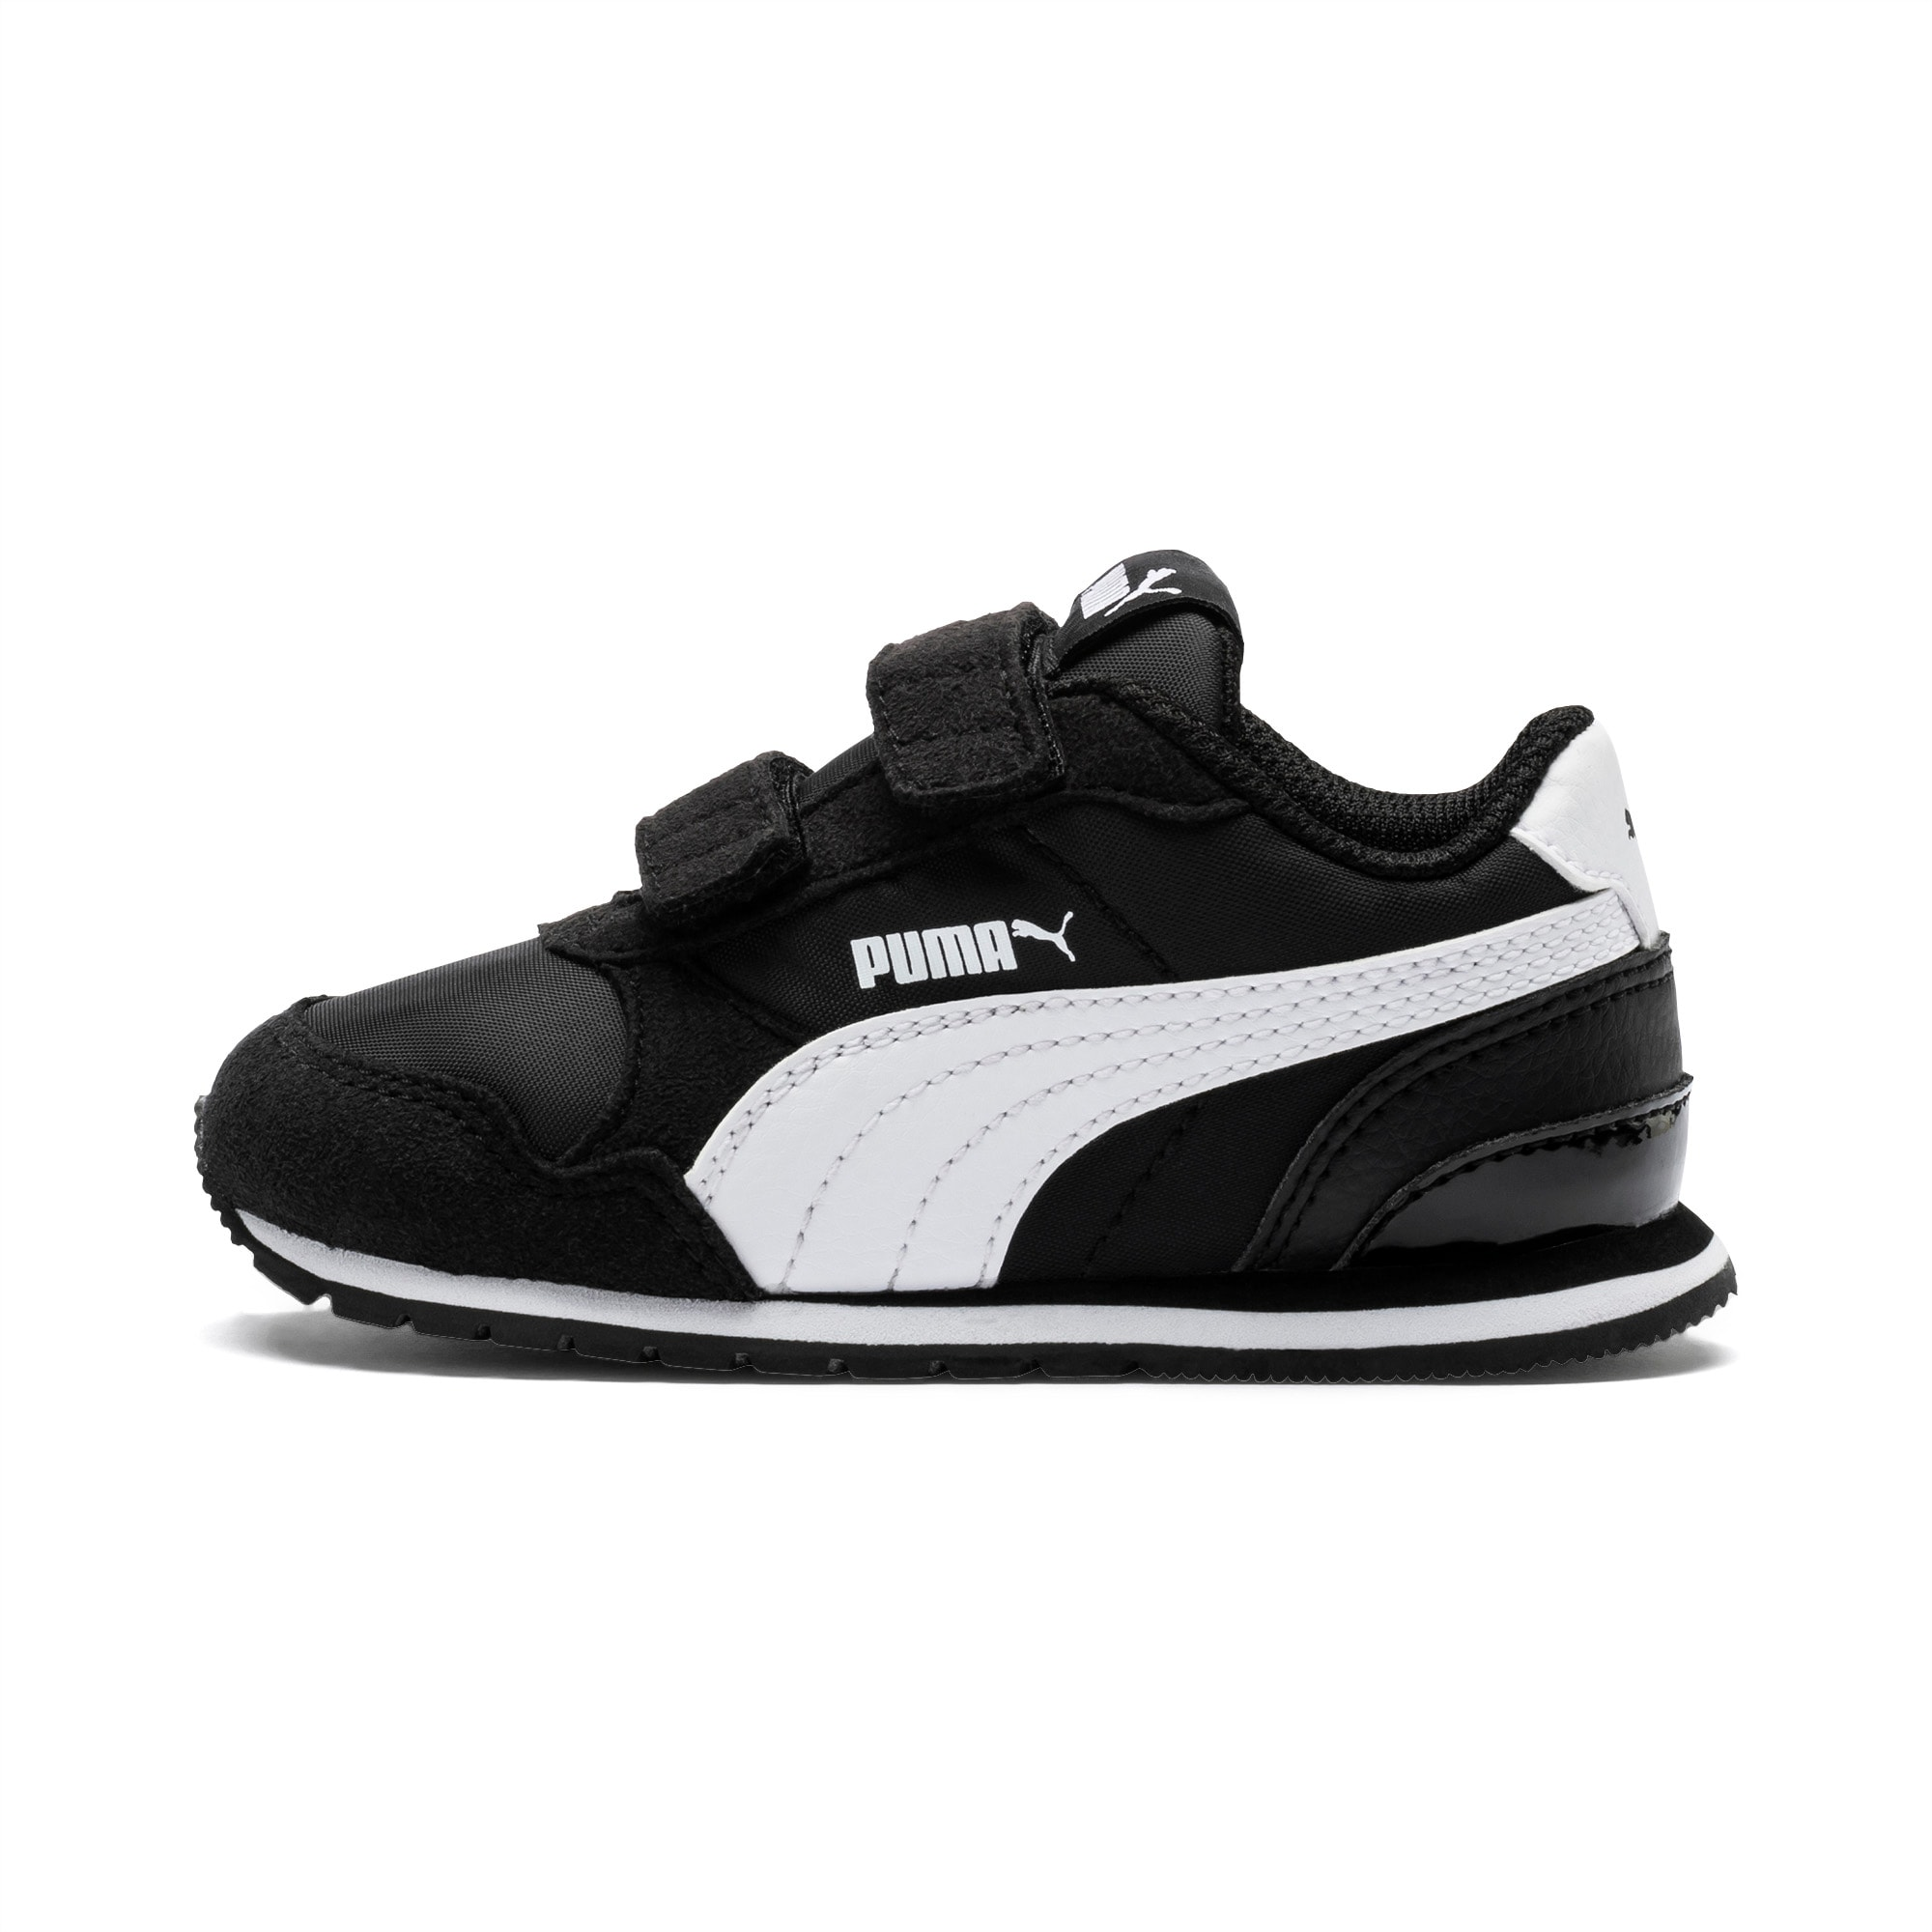 ST Runner V2 V Toddler Shoes | PUMA US